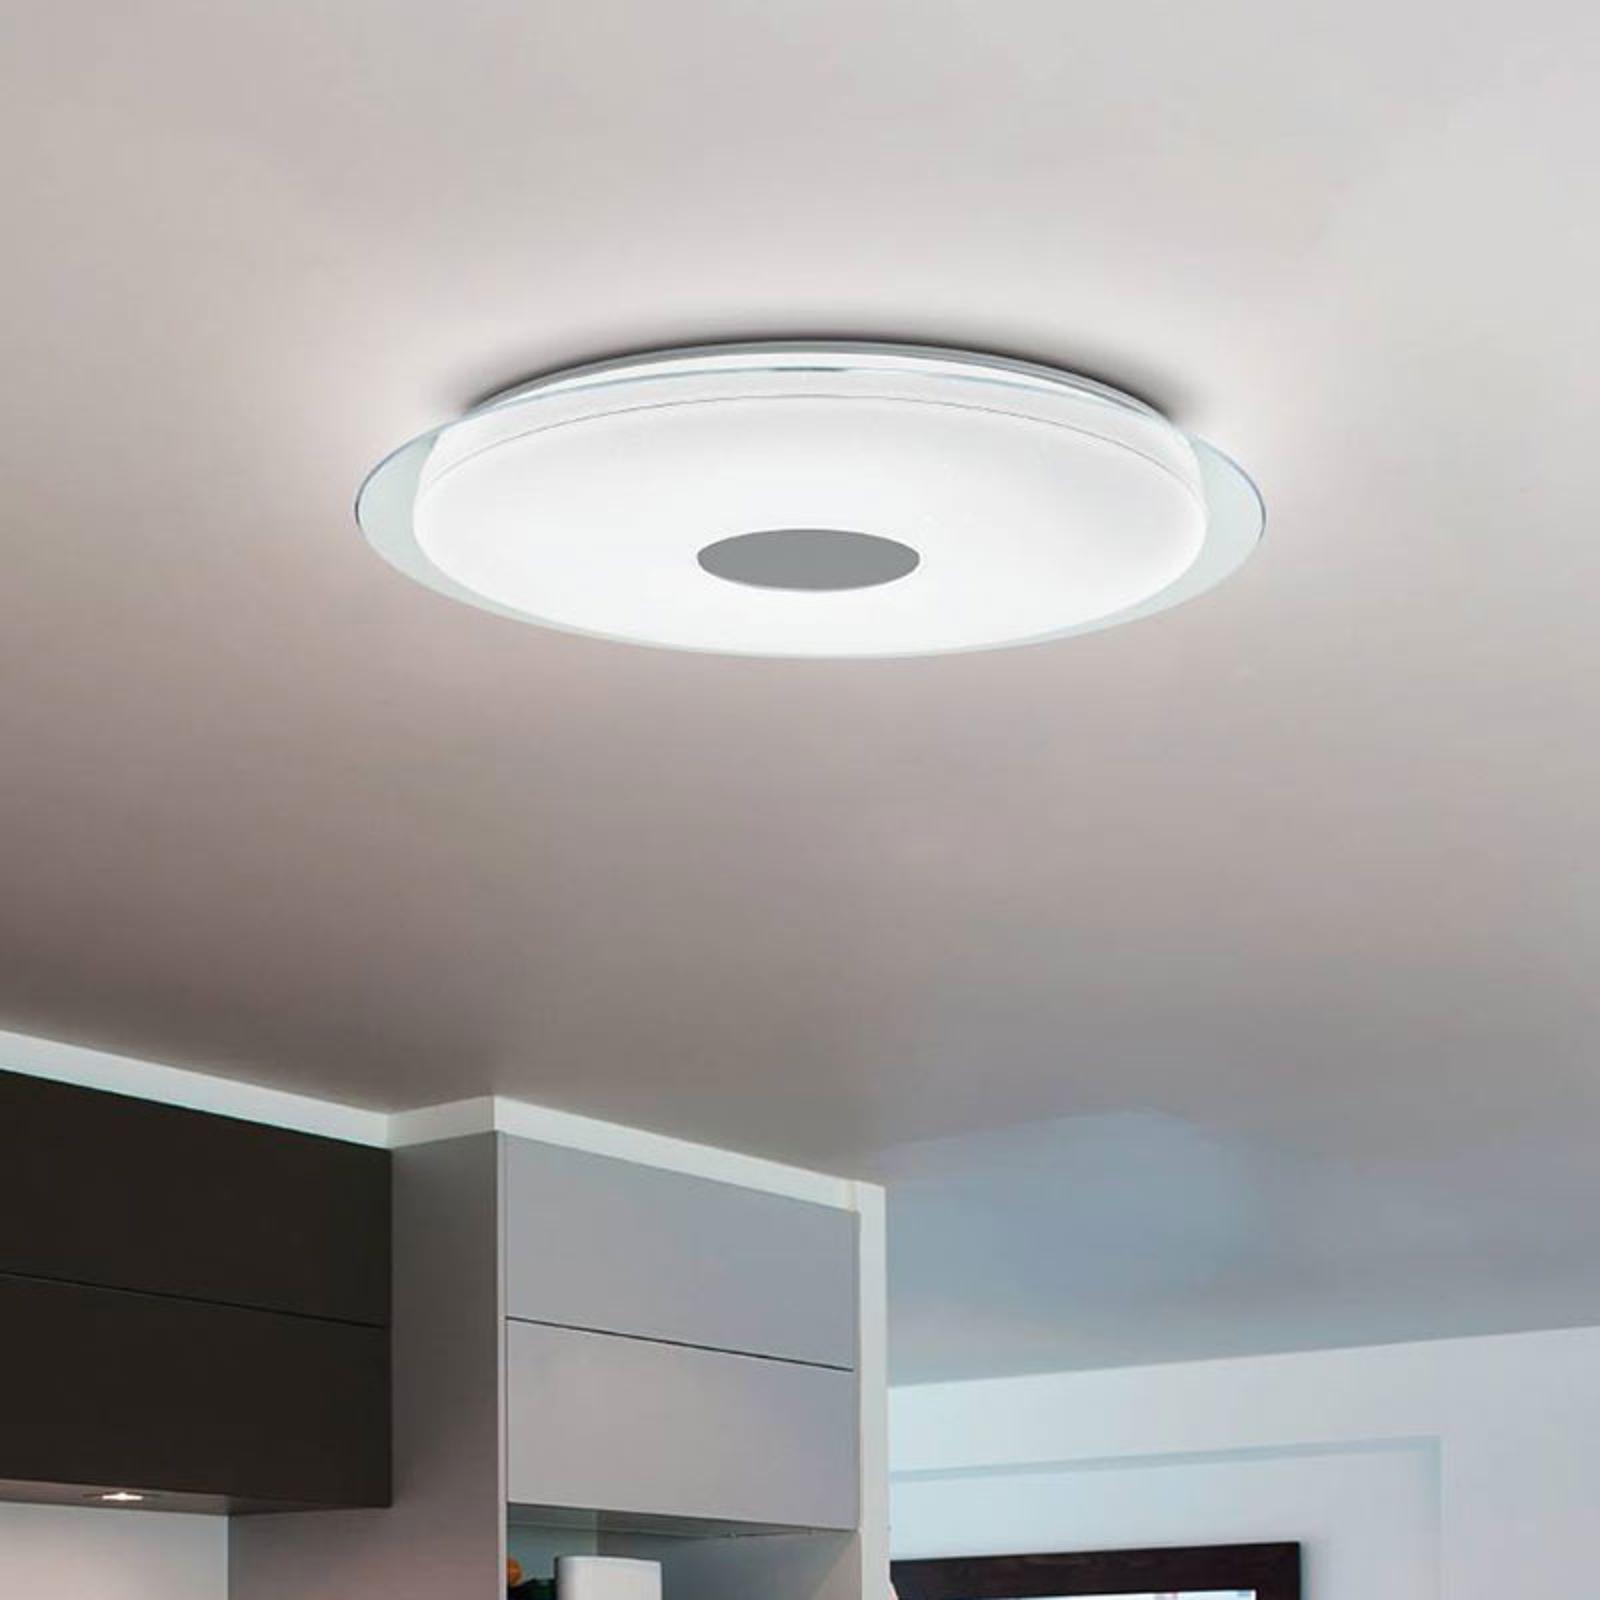 EGLO connect Lanciano-C LED plafondlamp Ø 77cm